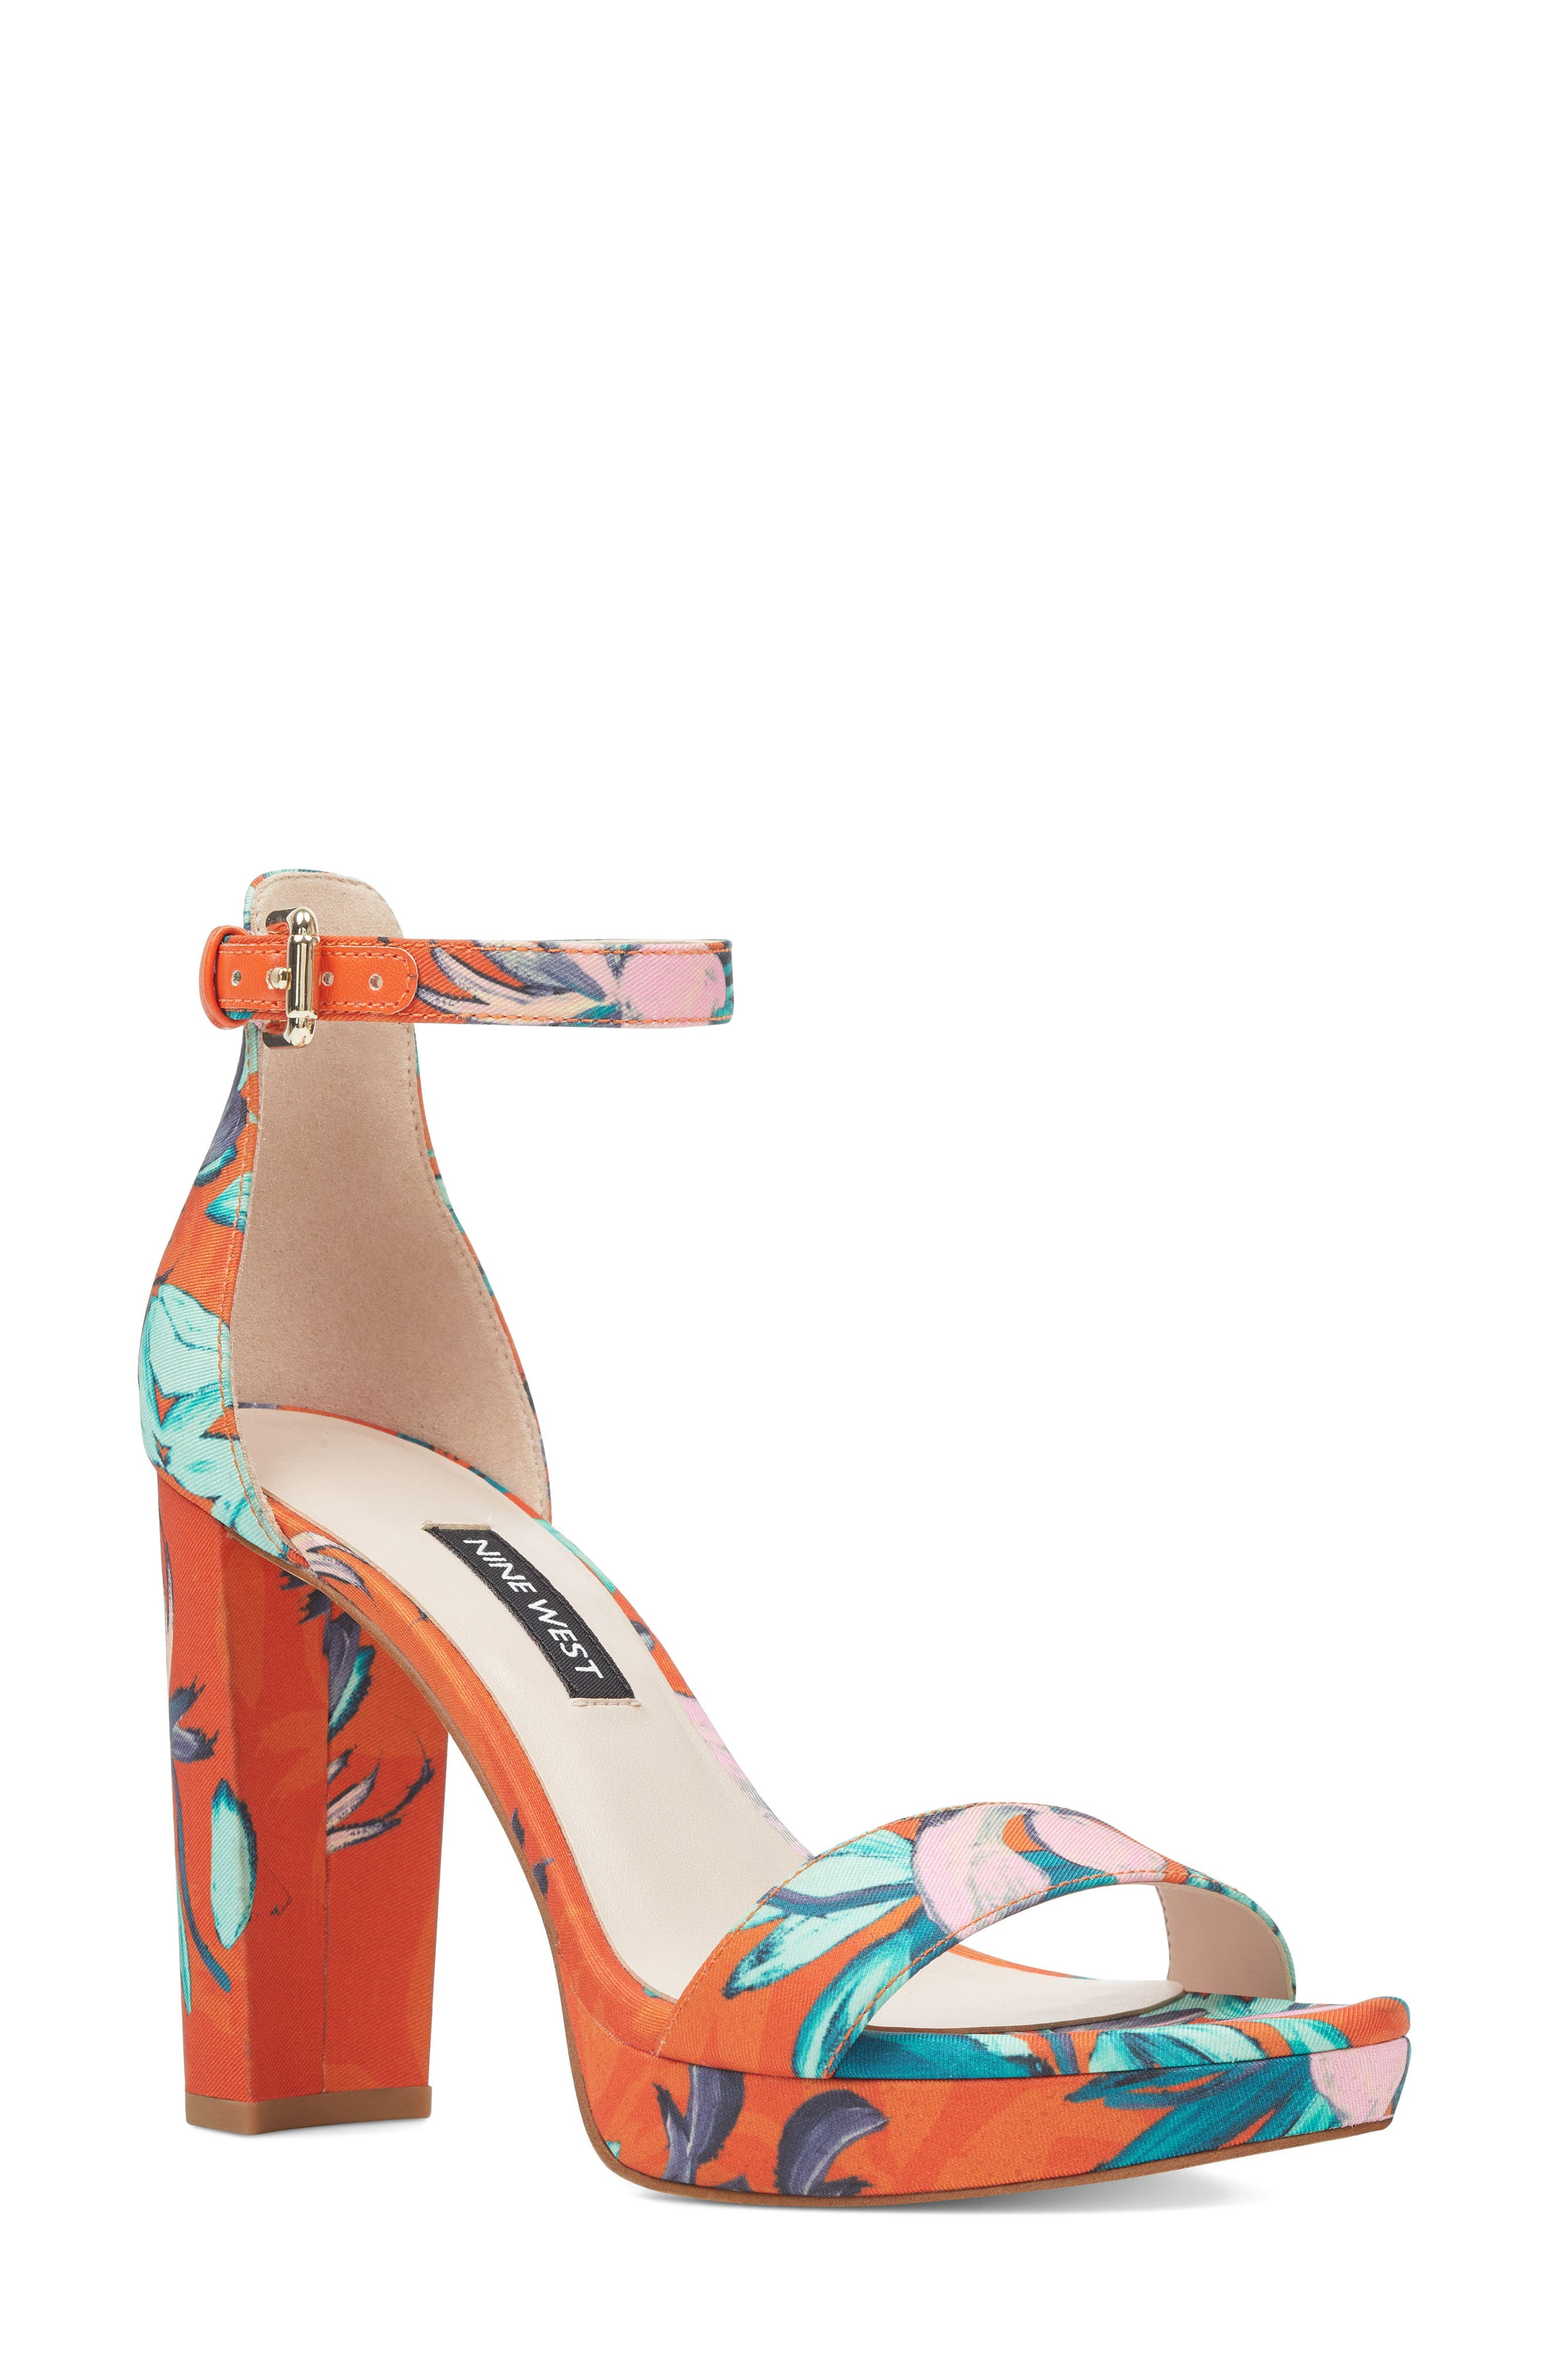 Dempsey Platform Sandal,                             Main thumbnail 1, color,                             ORANGE MULTI FABRIC